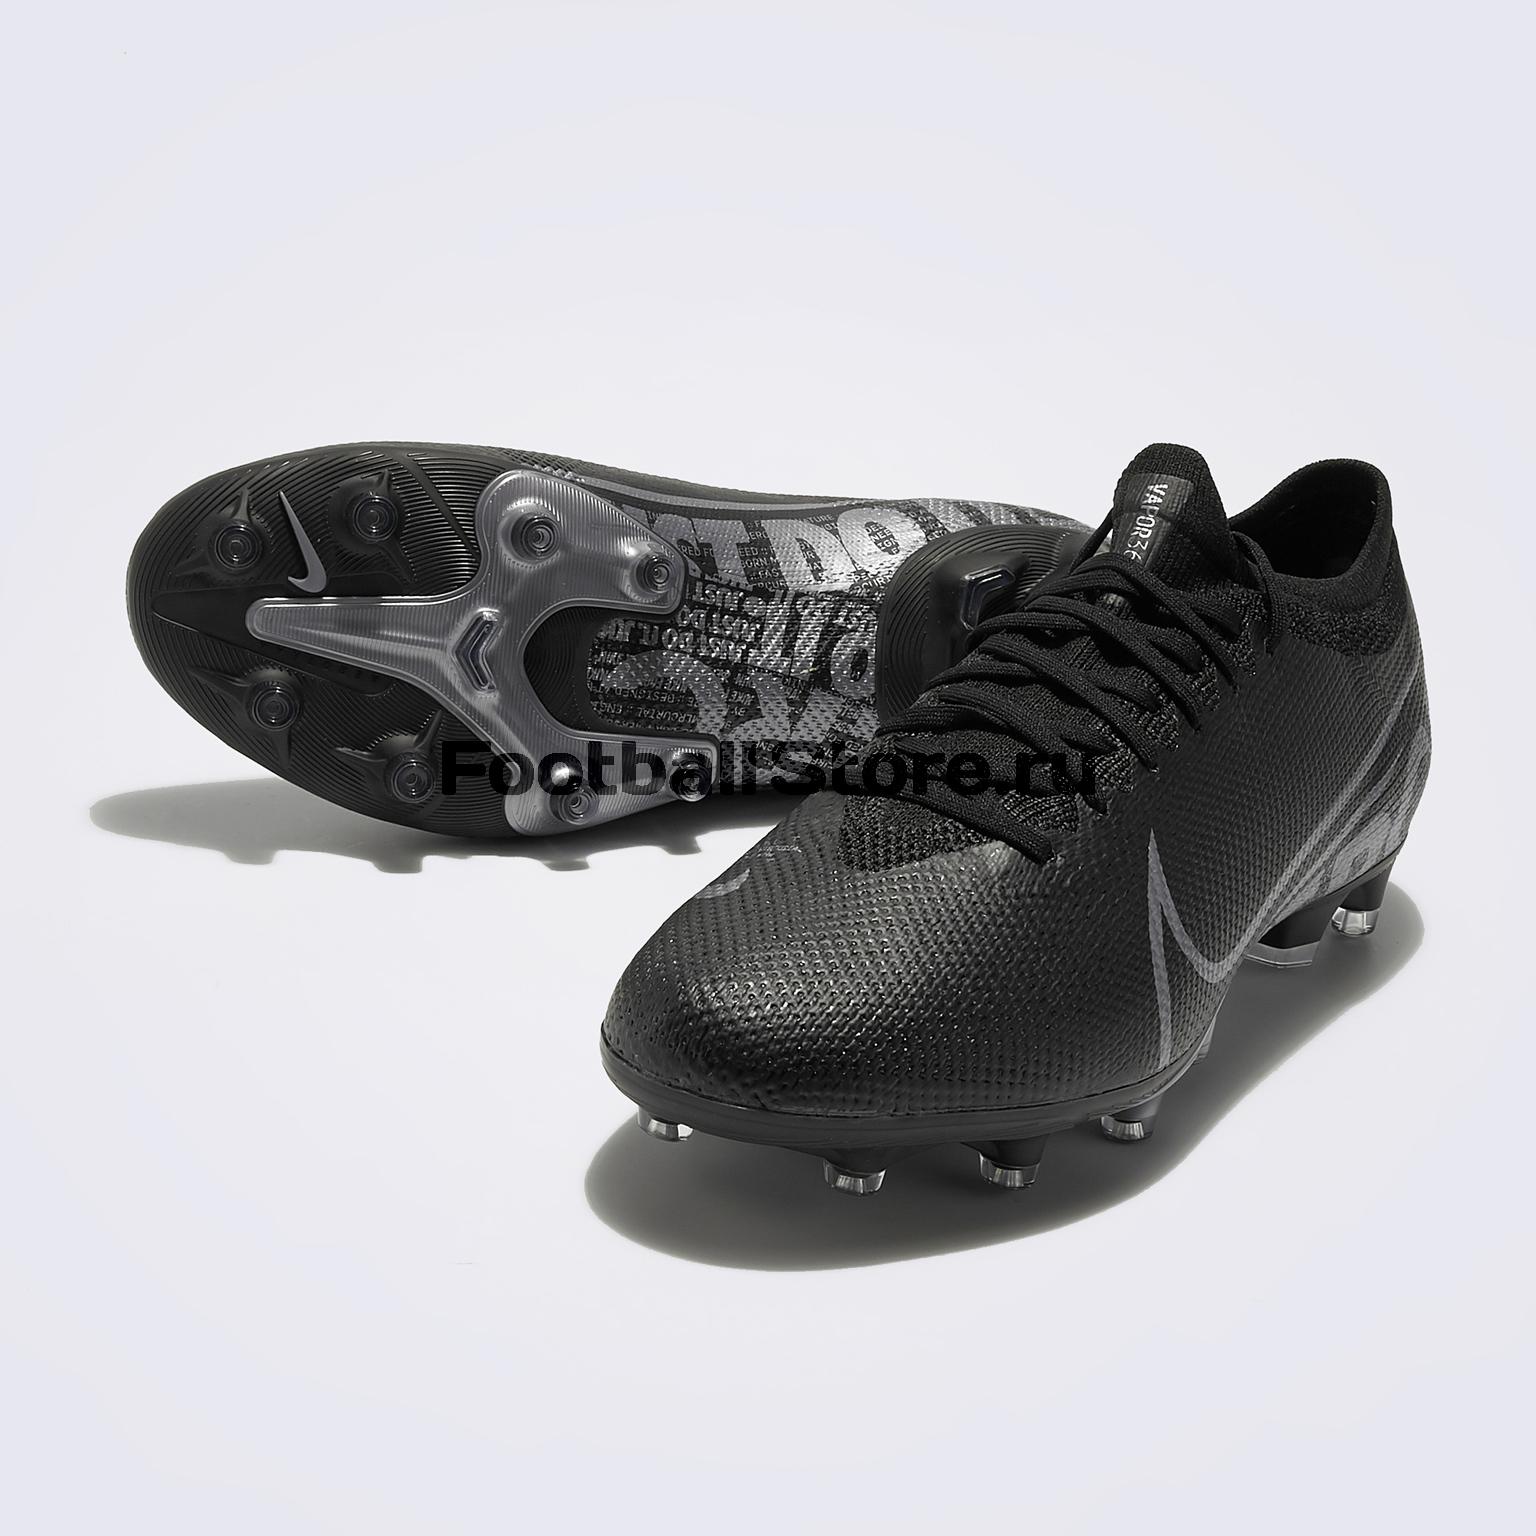 Бутсы Nike Vapor 13 Pro AG-Pro AT7900-001 бутсы nike pds mercurial vapor sg 10